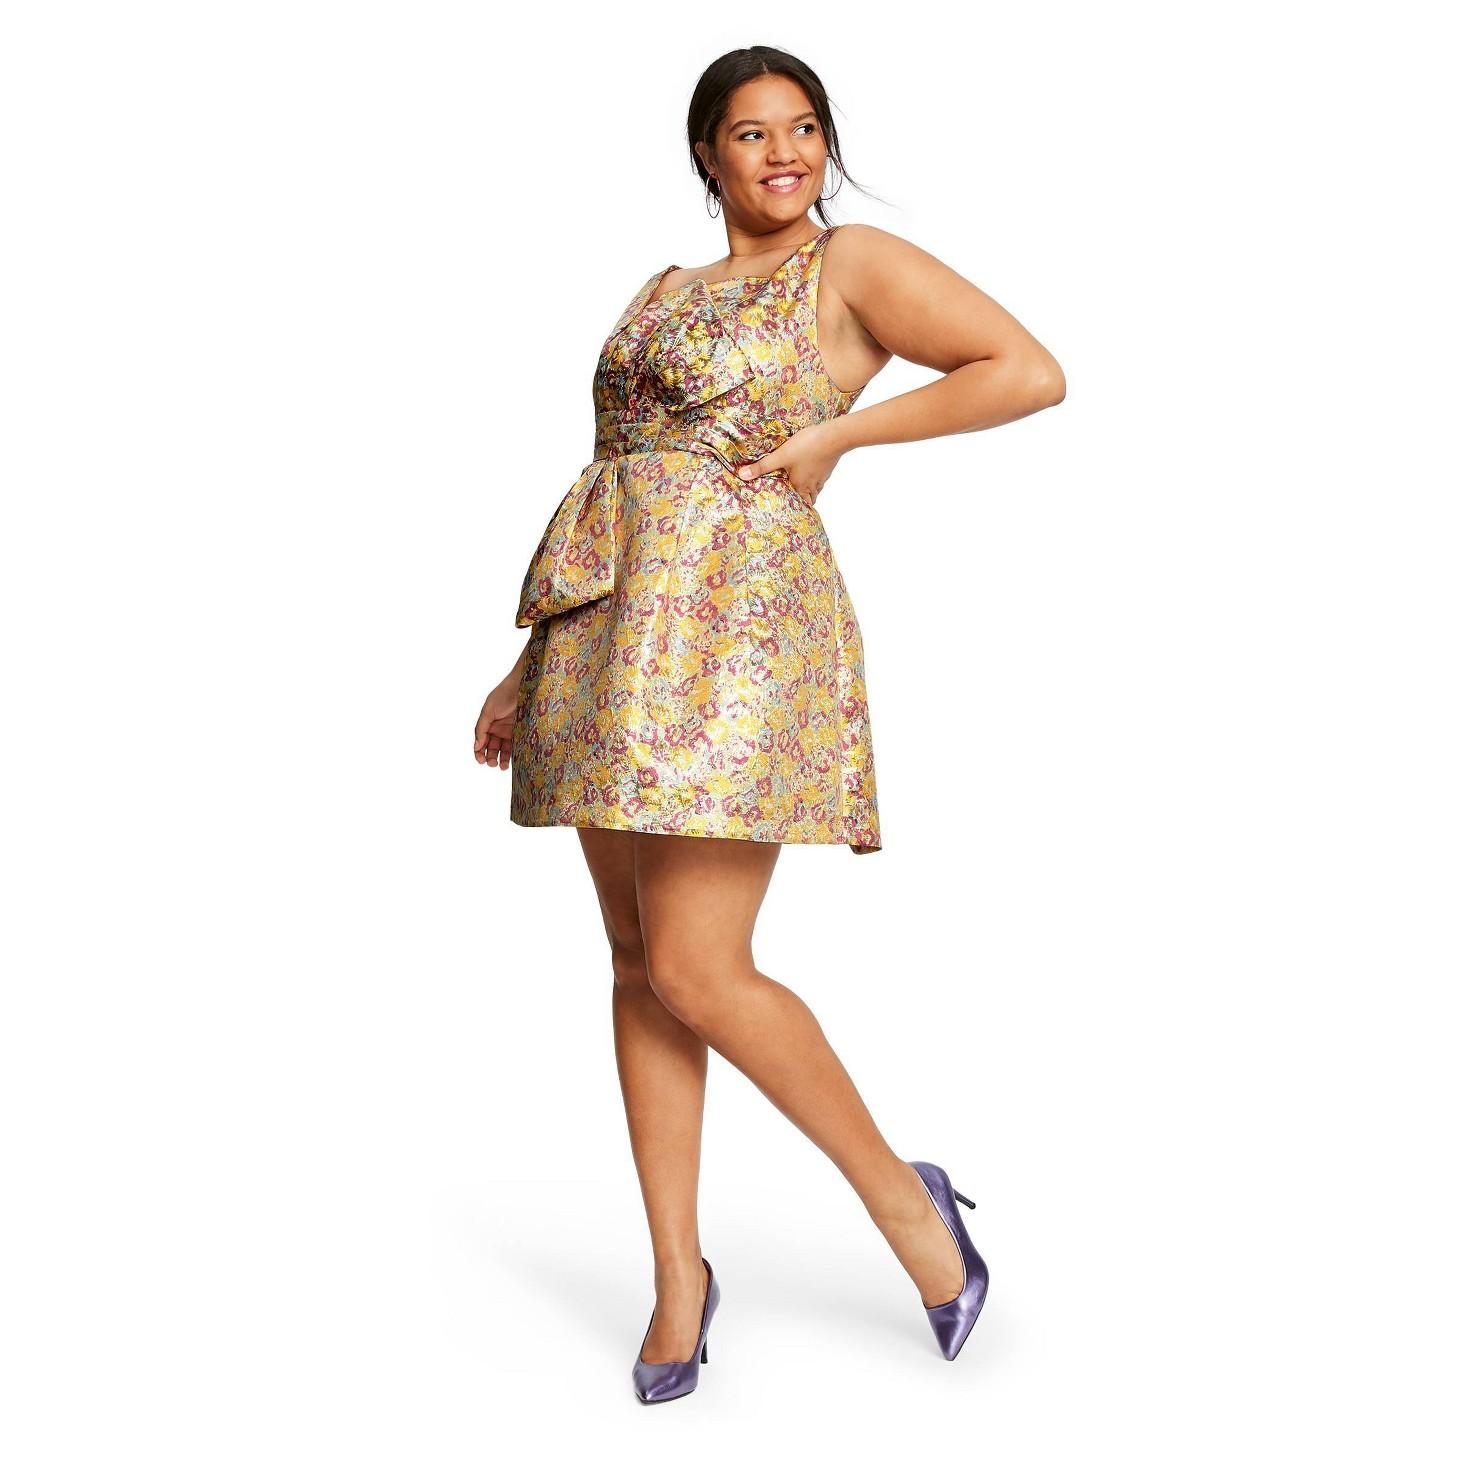 Zac Posen for Target Plus Size Floral Print Sleeveless Brocade Mini Dress